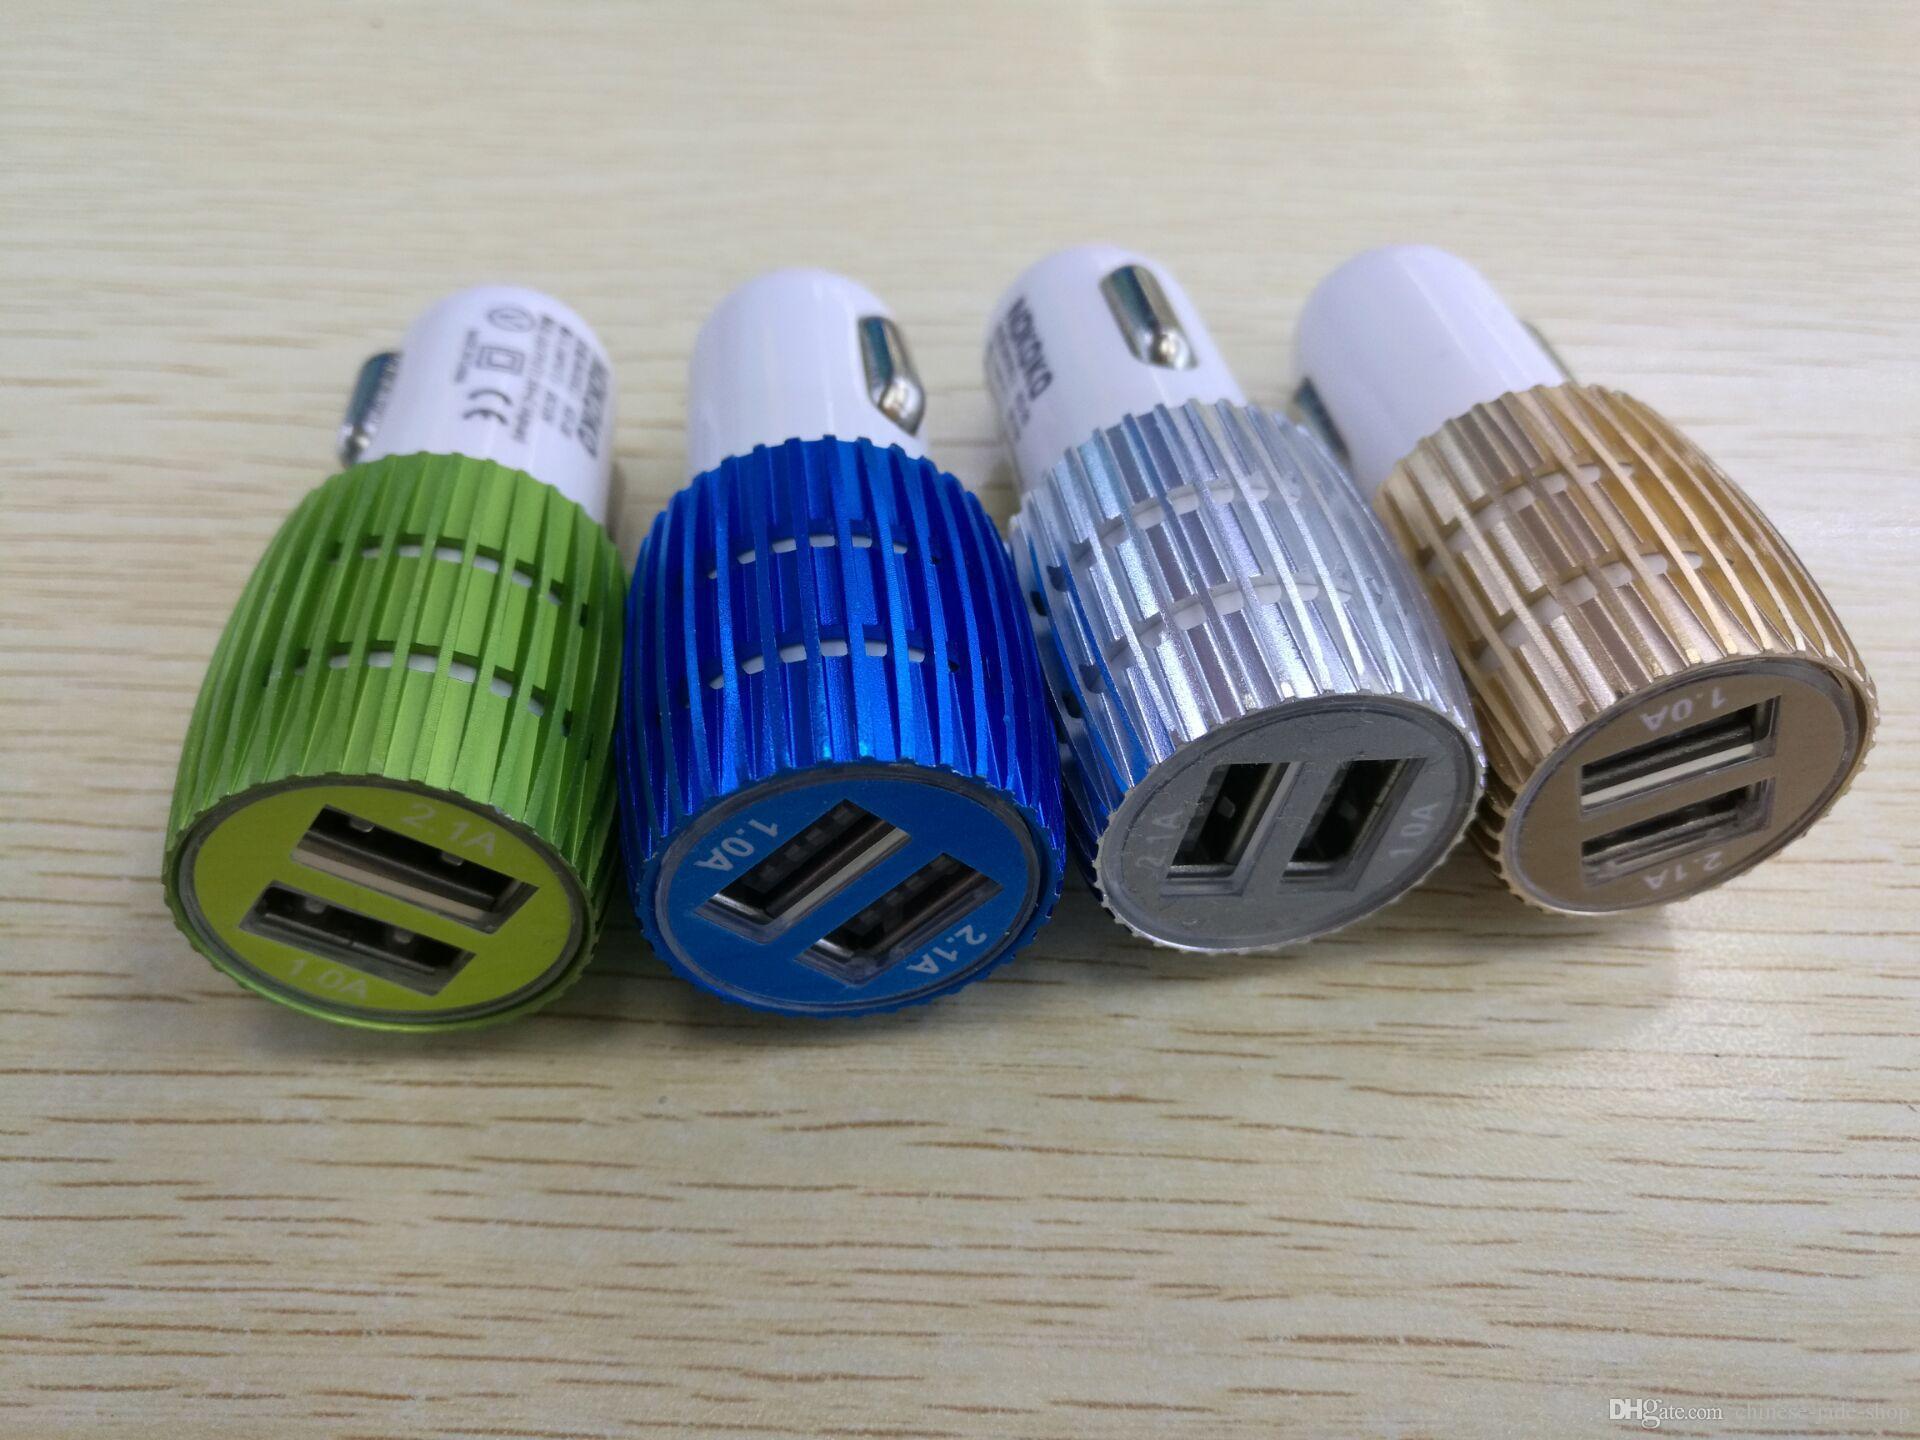 Real es ist 1A Dual USB Auto Ladegerät Blaues Licht LED Aluminiumlegierung Metall Adapter für Smartphone 200 teile / los